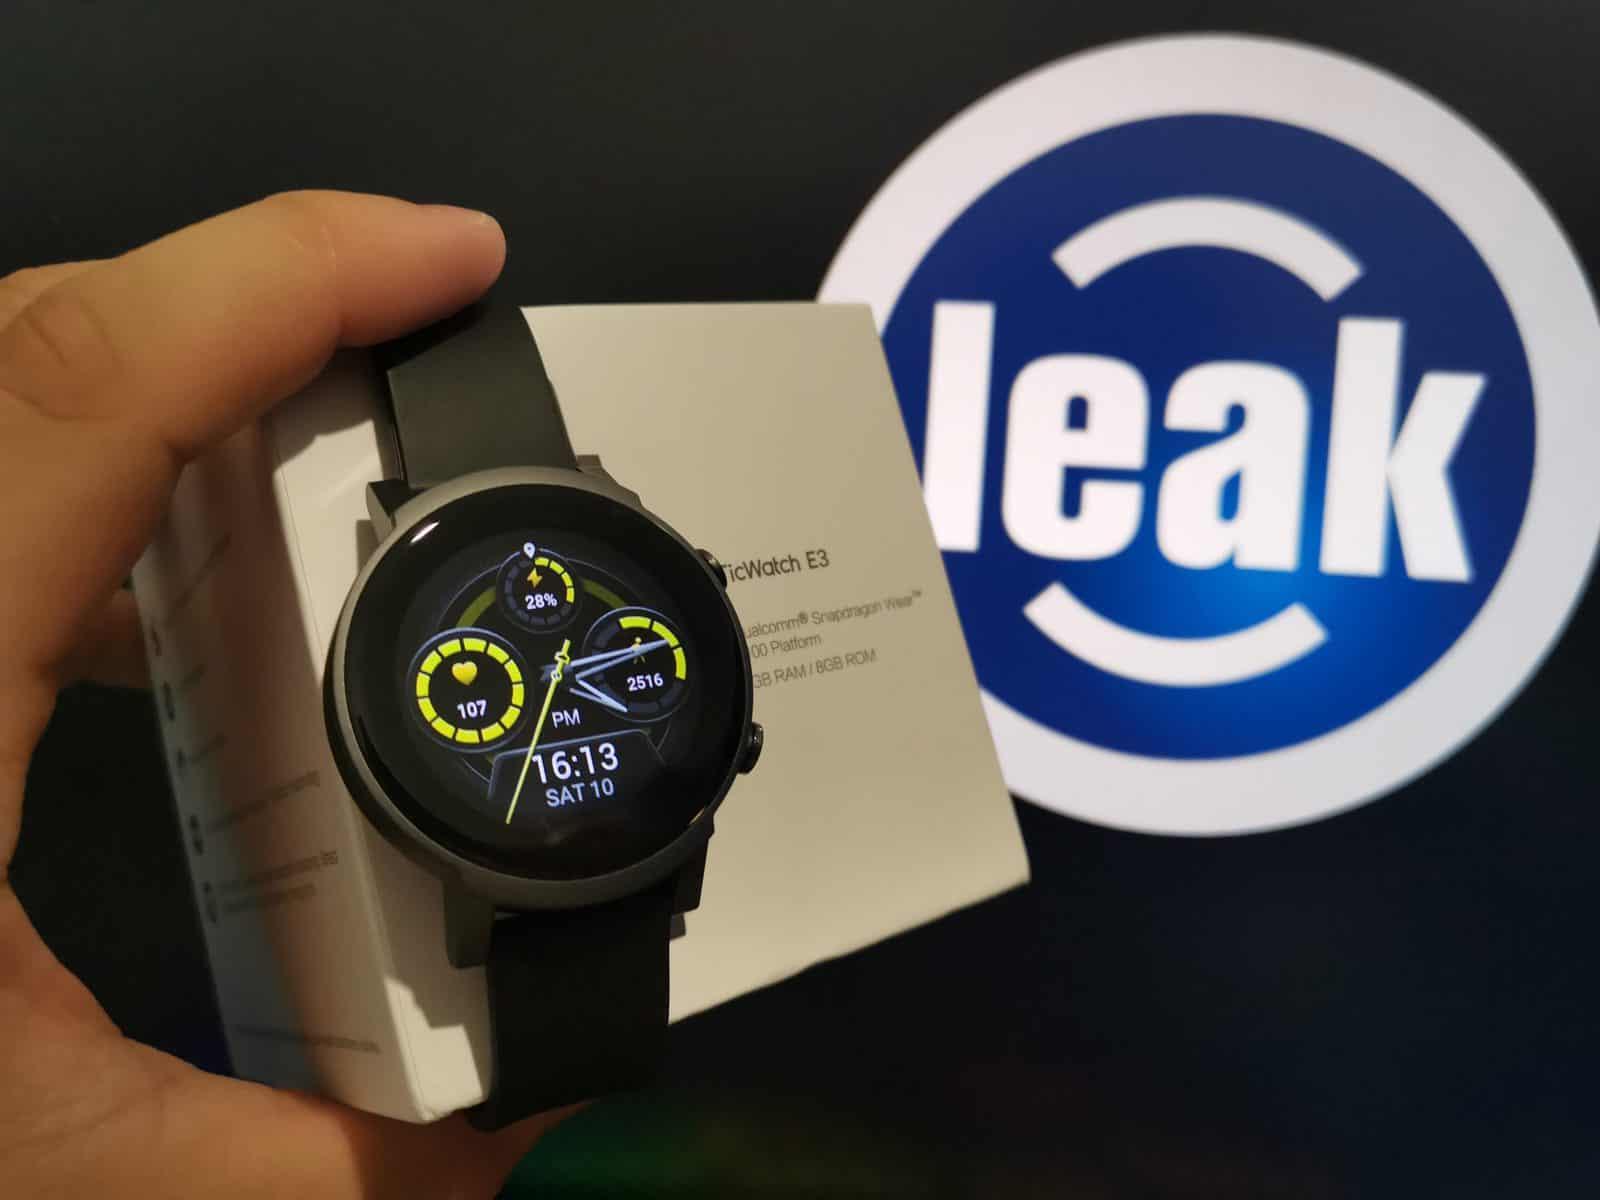 TicWatch E3 smartwatch